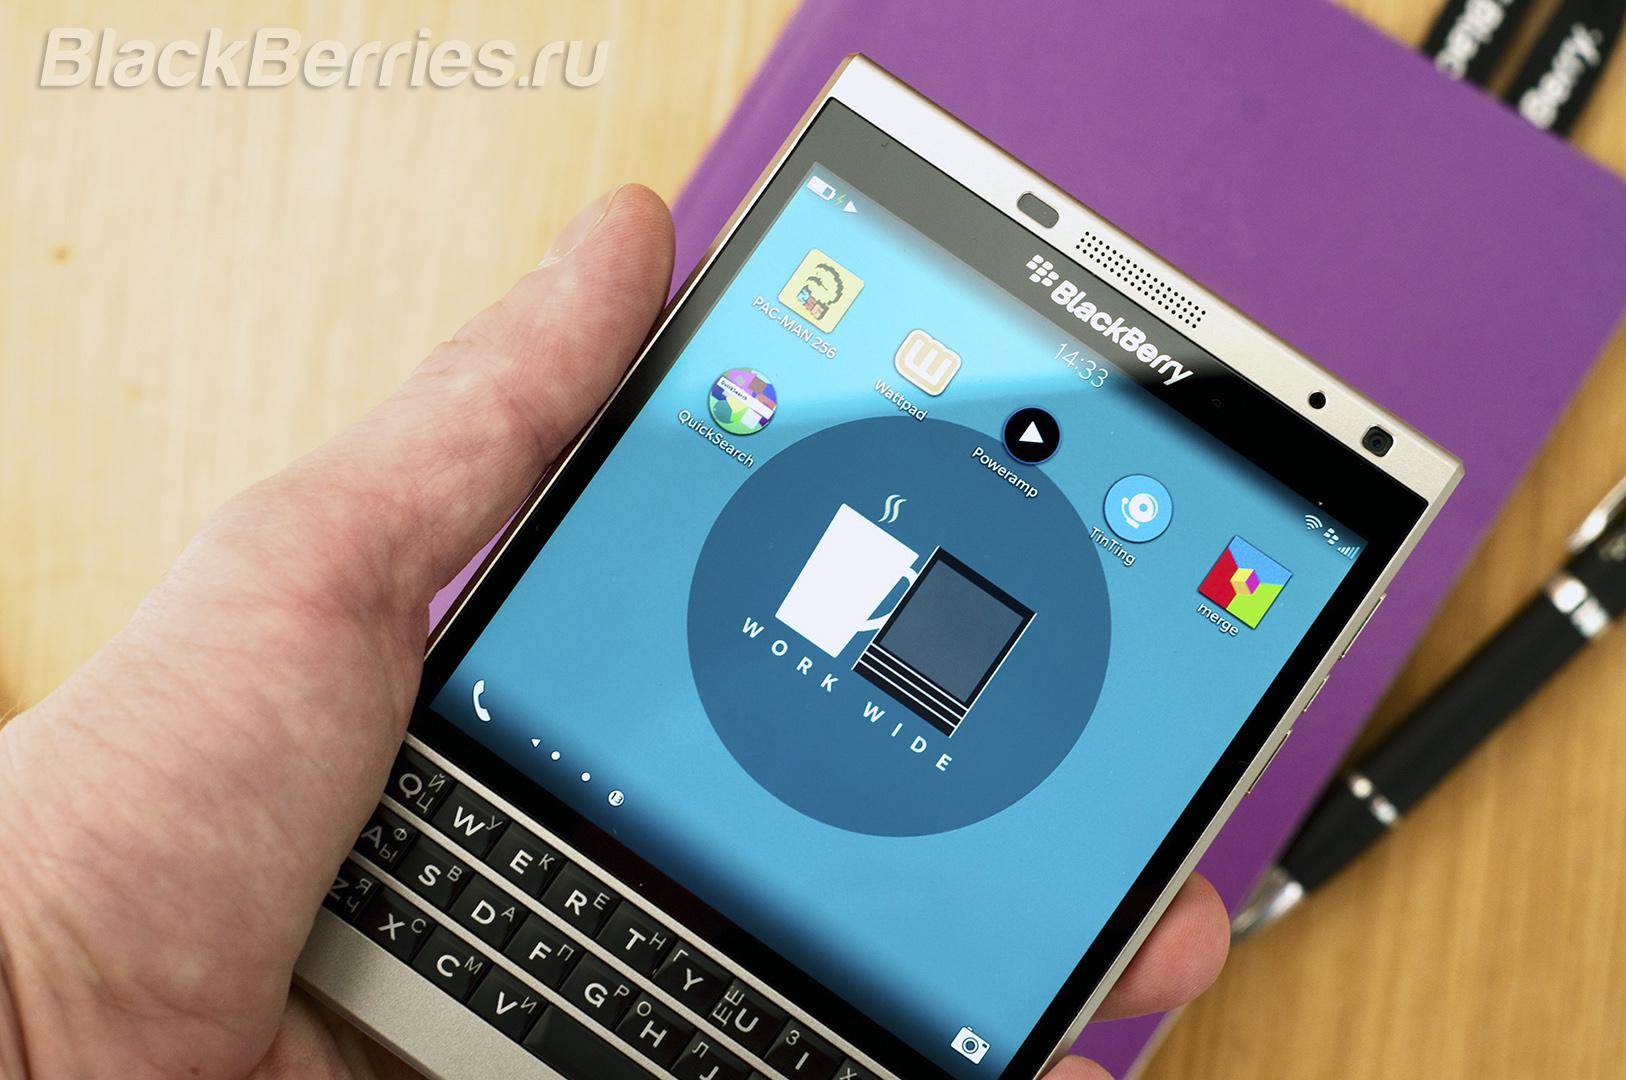 BlackBerry-Passport-SE-Apps-29-08-4